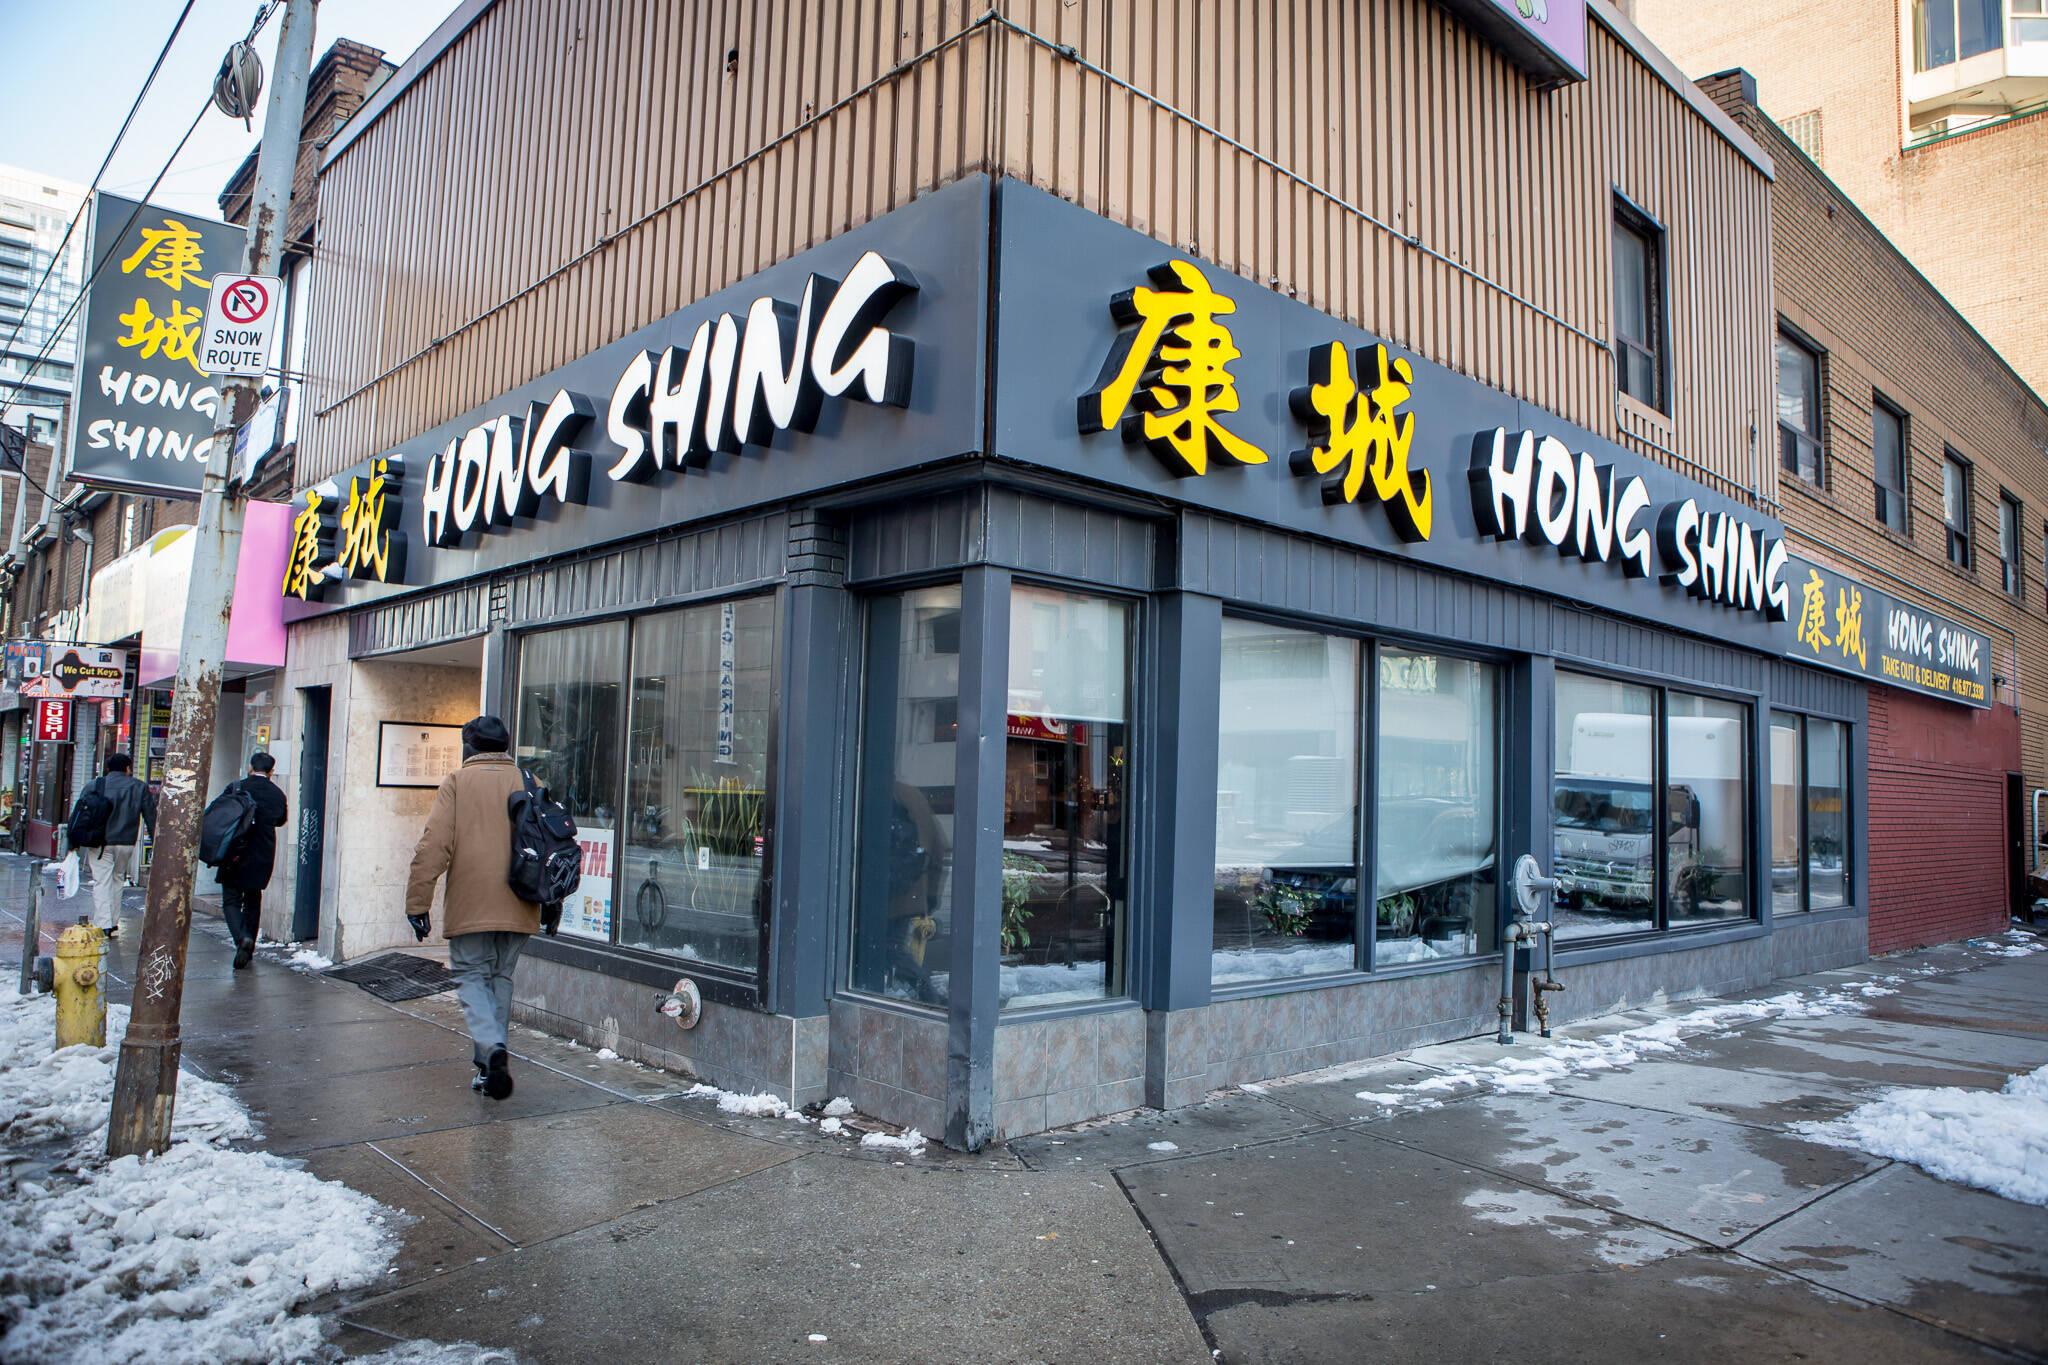 hong shing restaurant